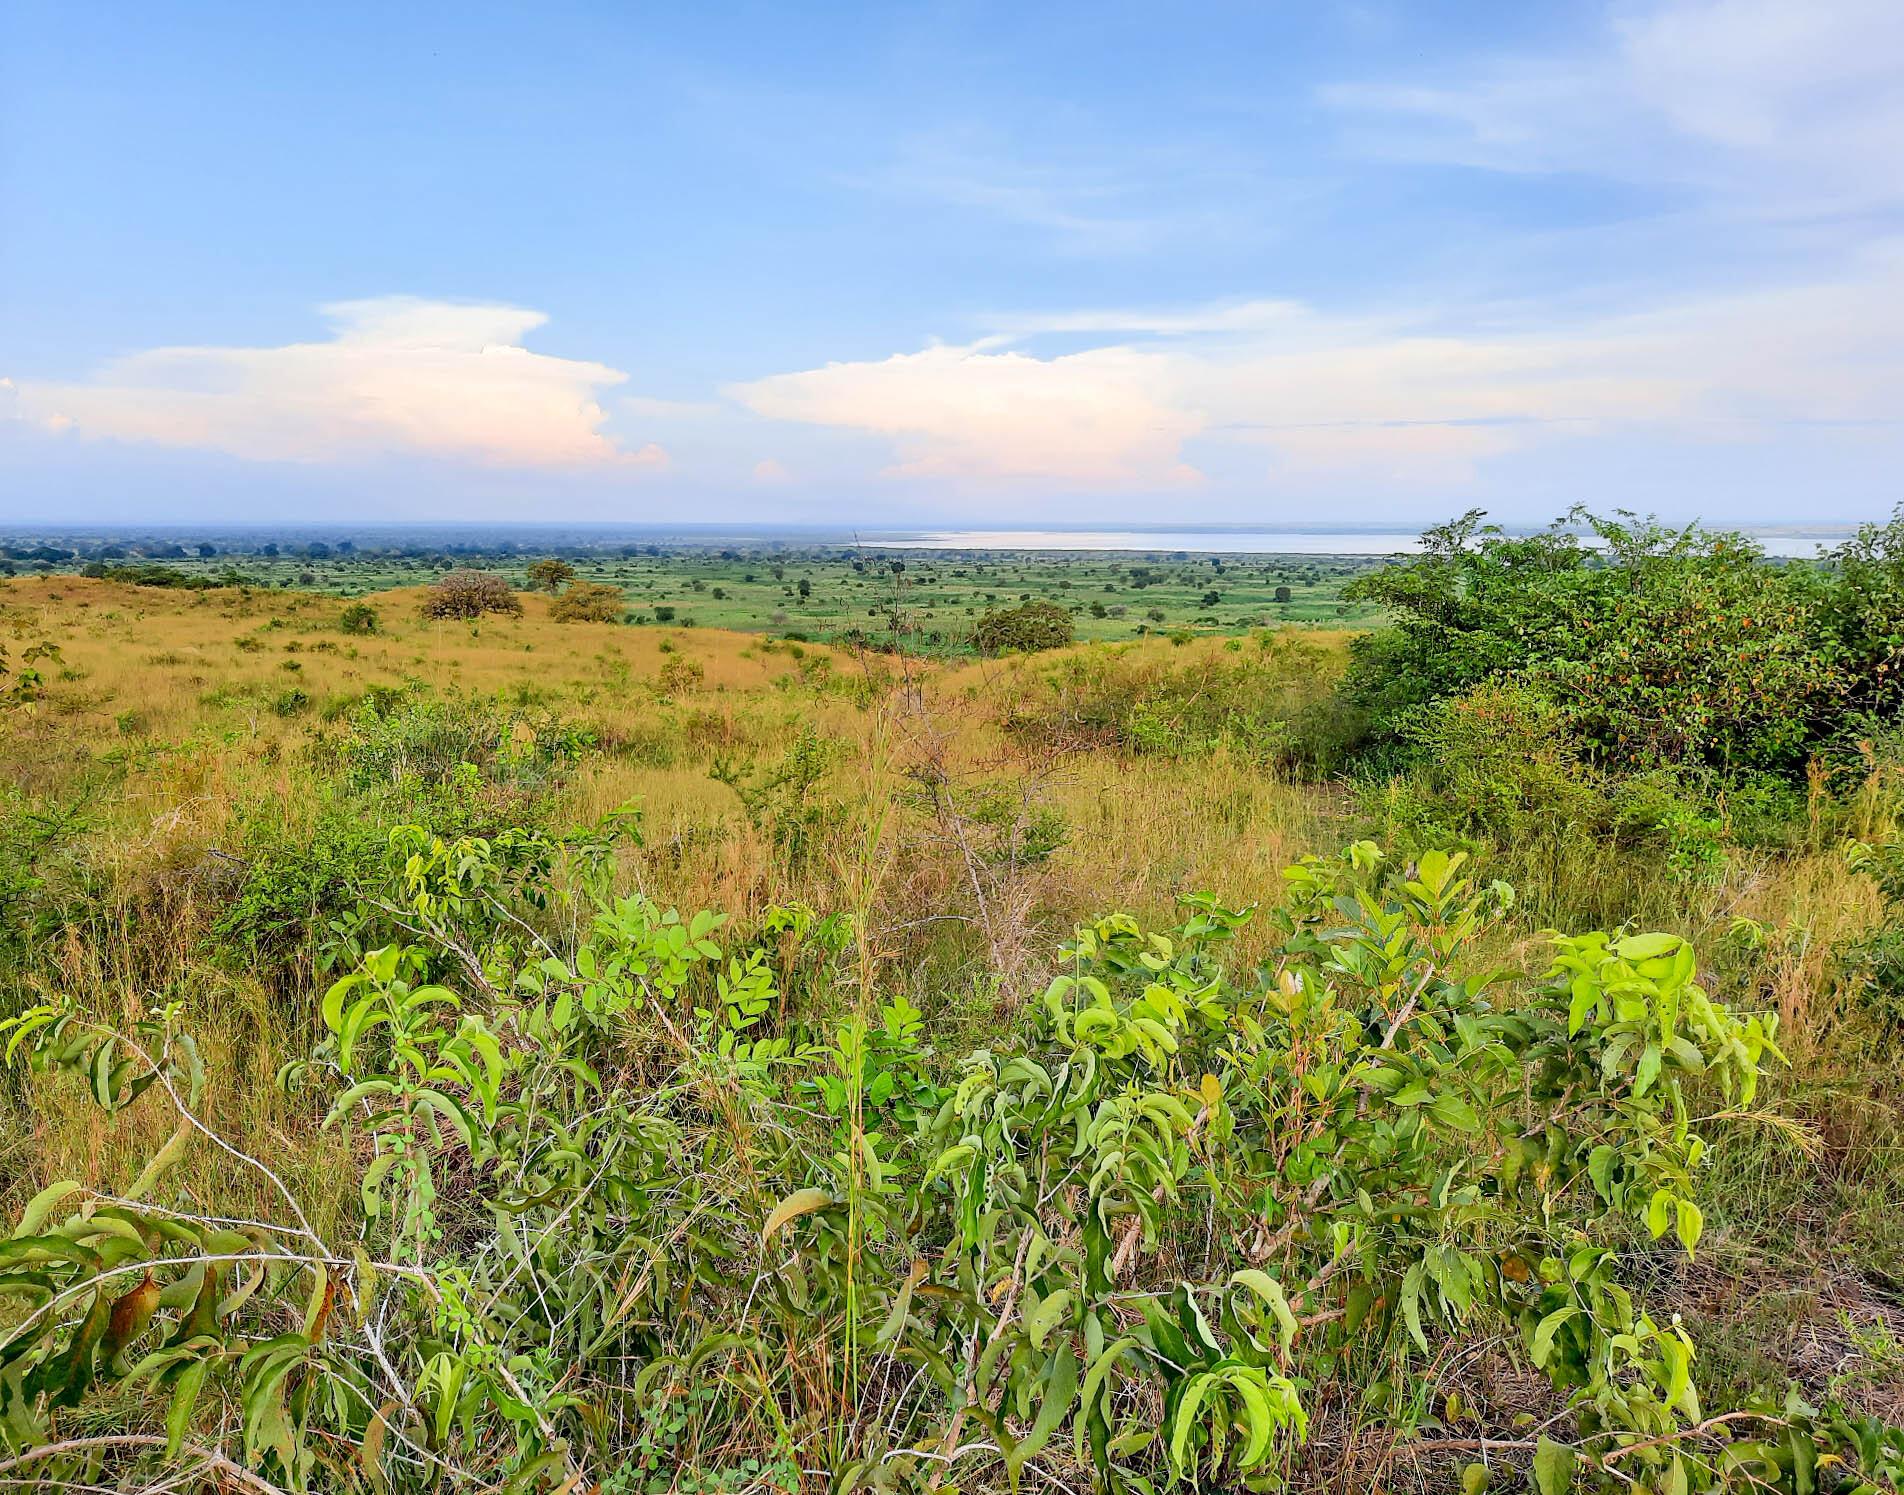 Terraformation partners with Environmental Defenders to restore 450 acres of native savannah and dry grassland in Uganda's Lake Albert region.